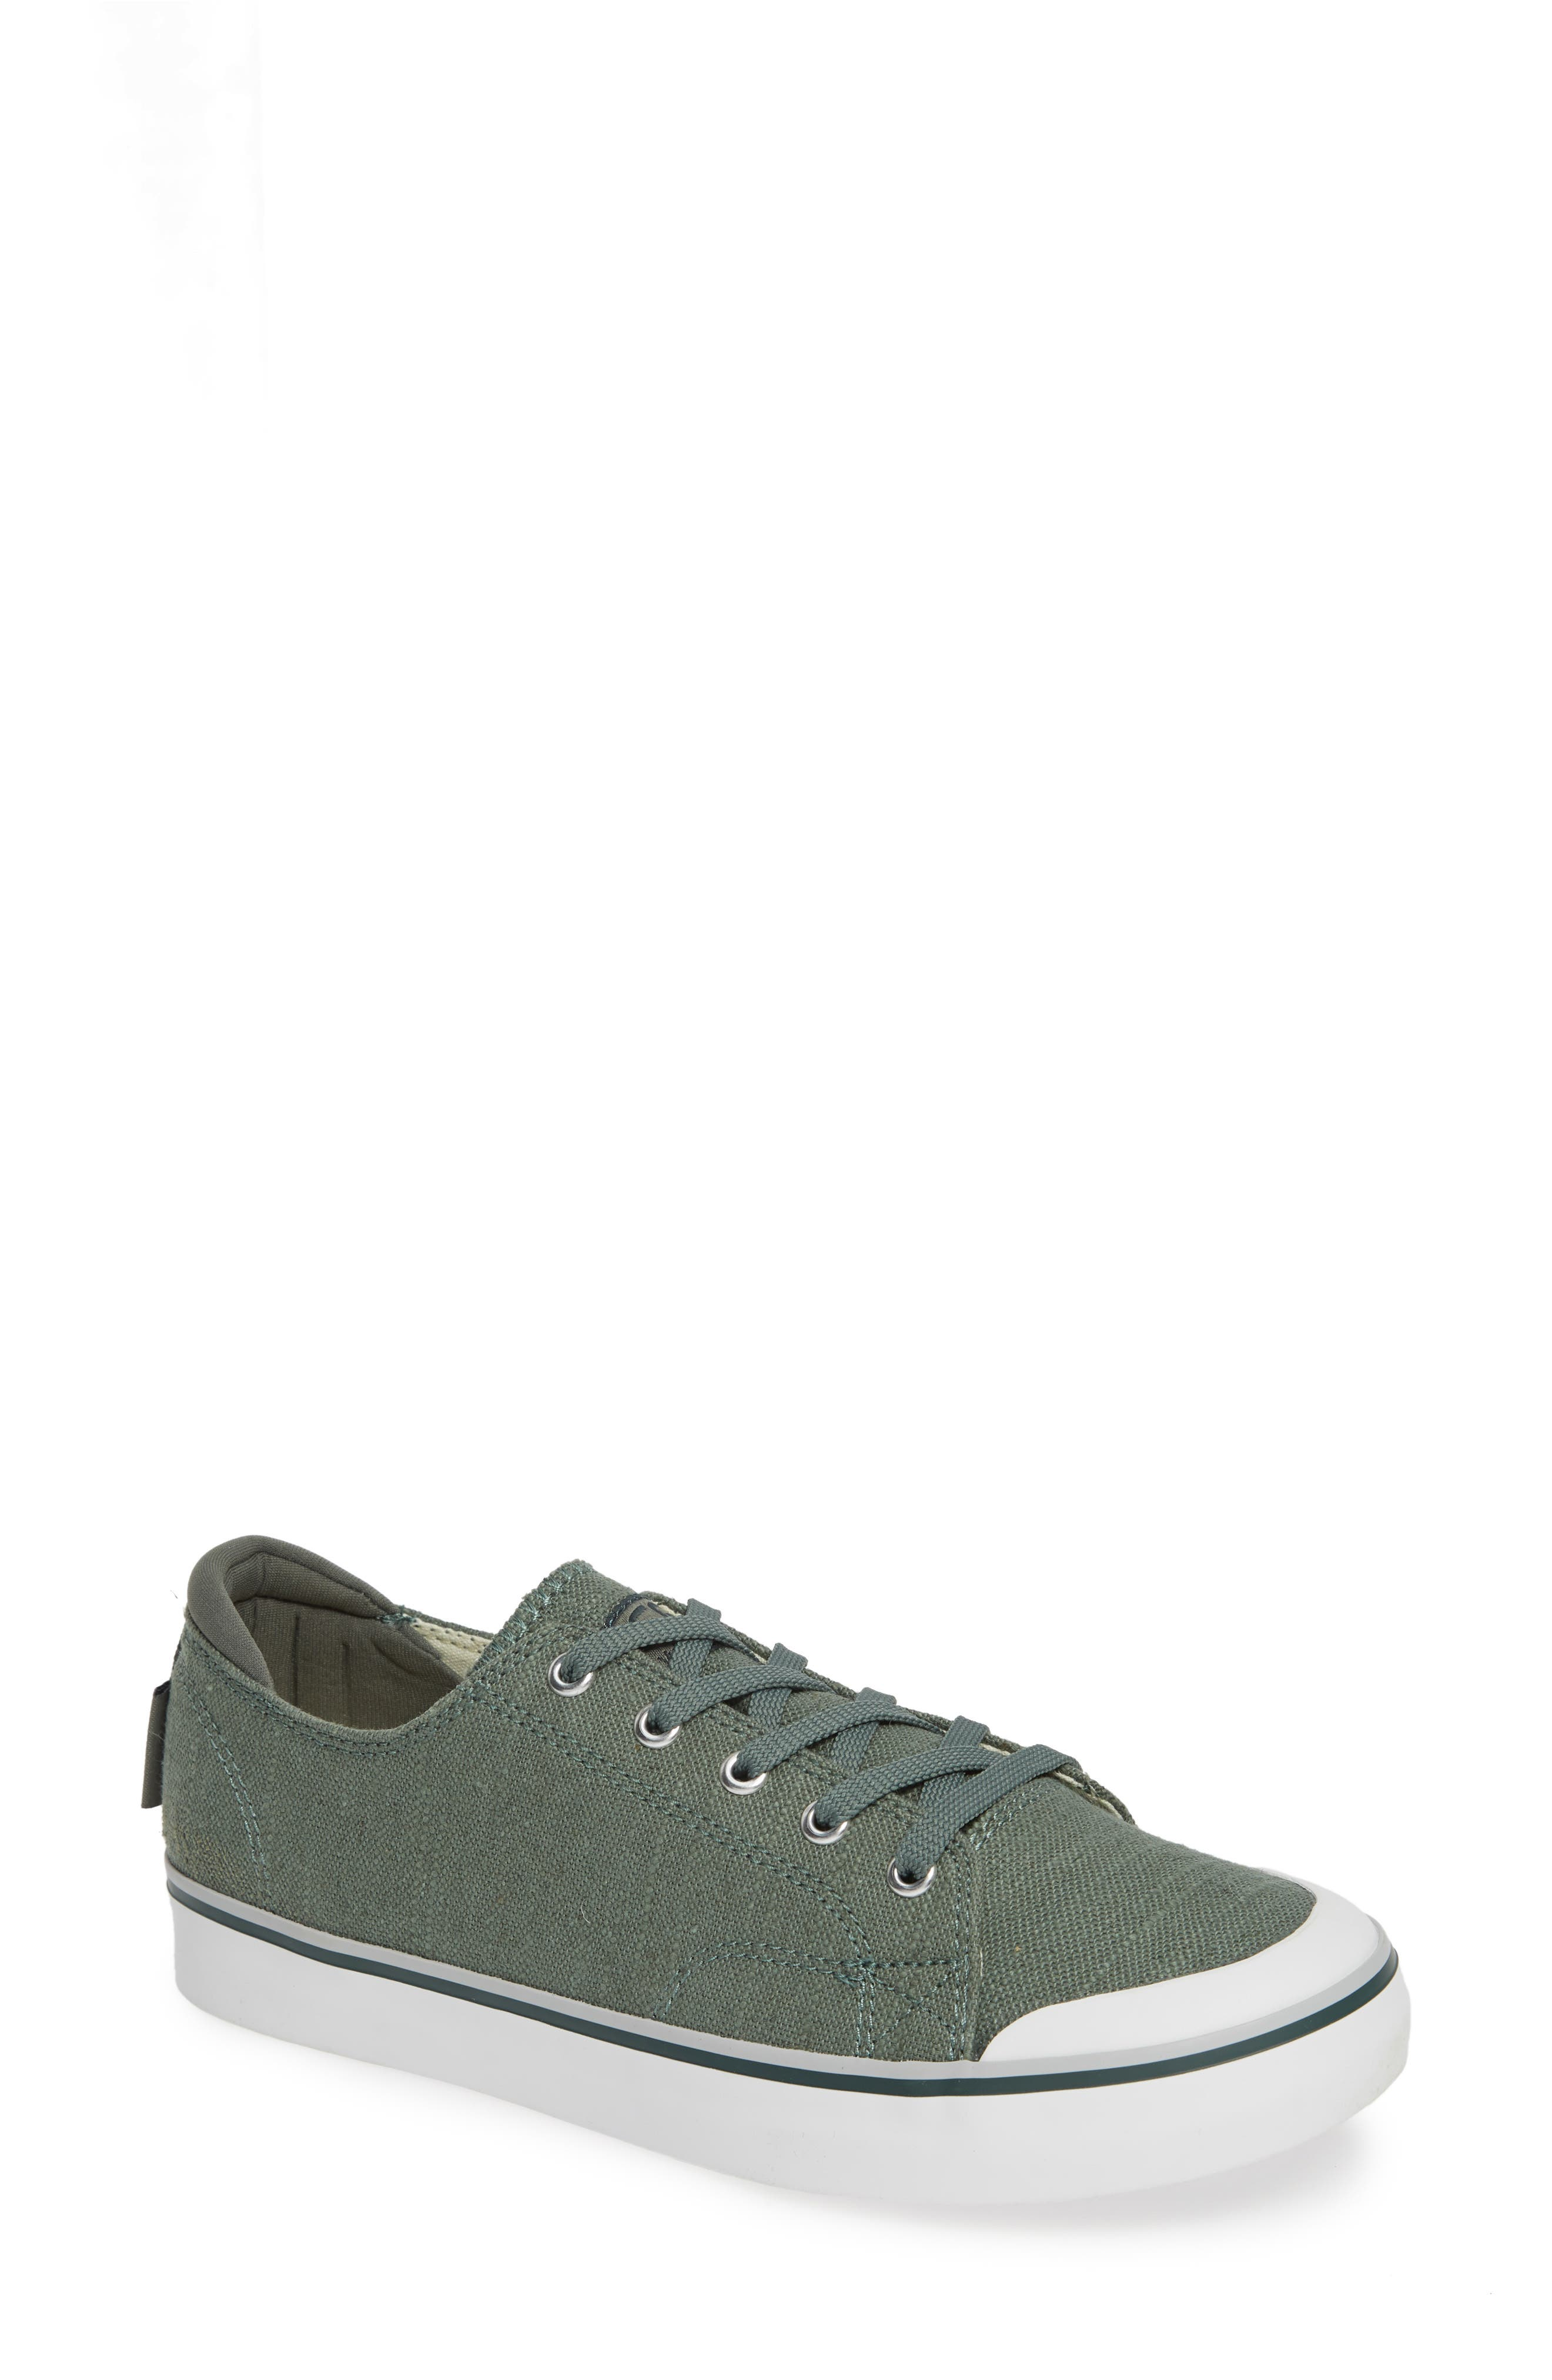 Keen Elsa Iii Sneaker, Green